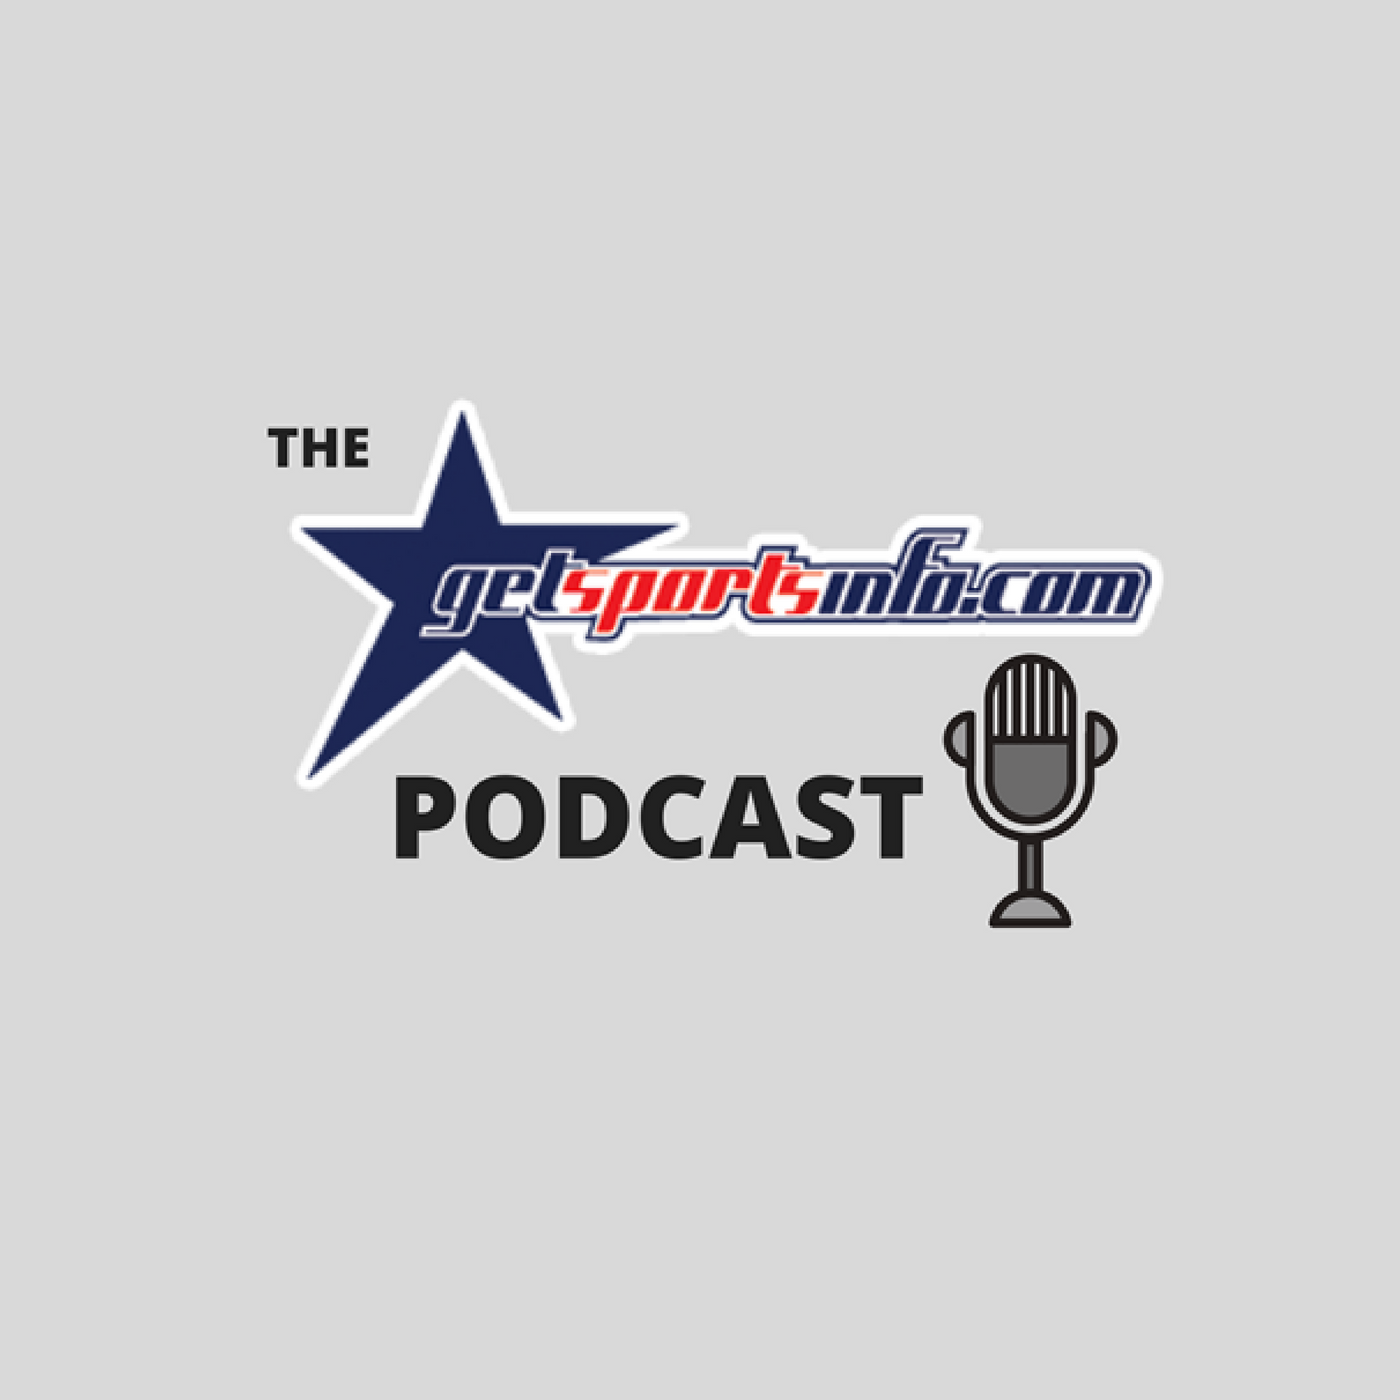 The GetSportsInfo Podcast logo